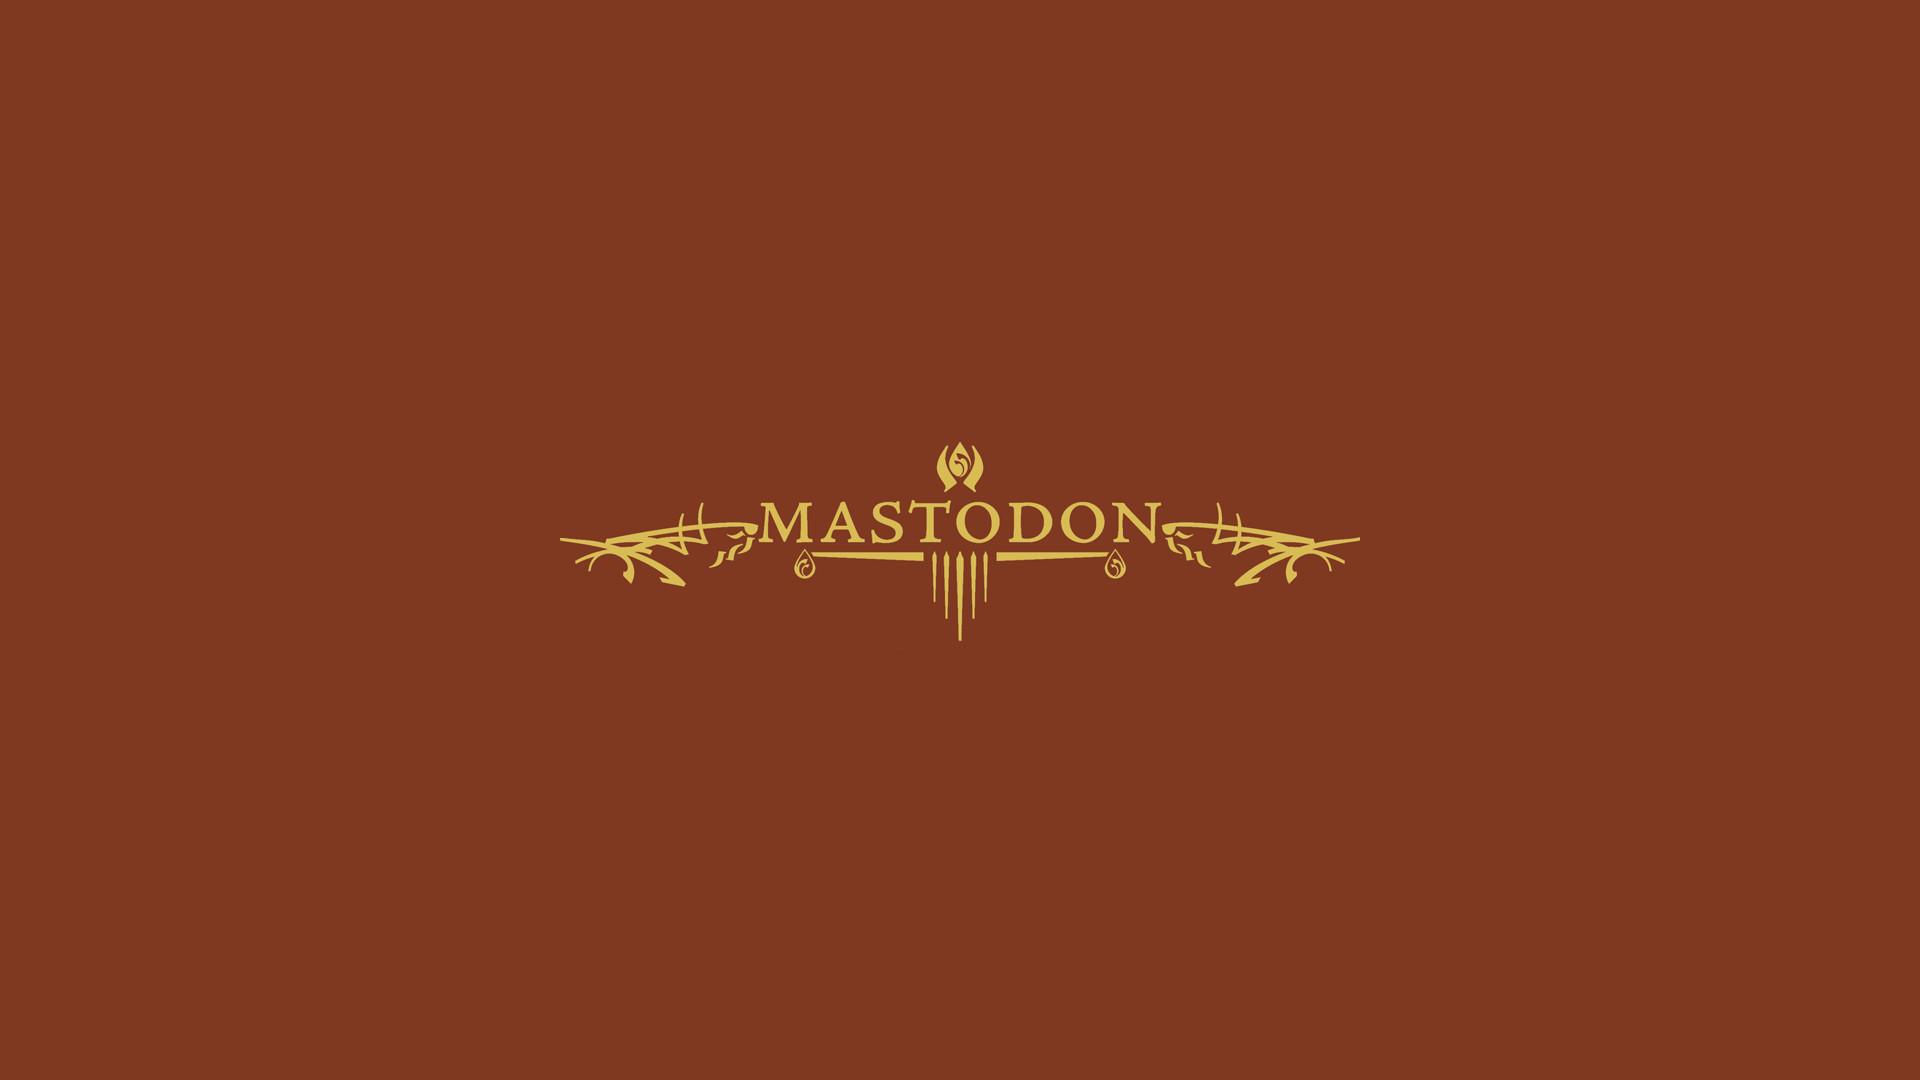 Mastodon Wallpapers – Wallpaper Cave